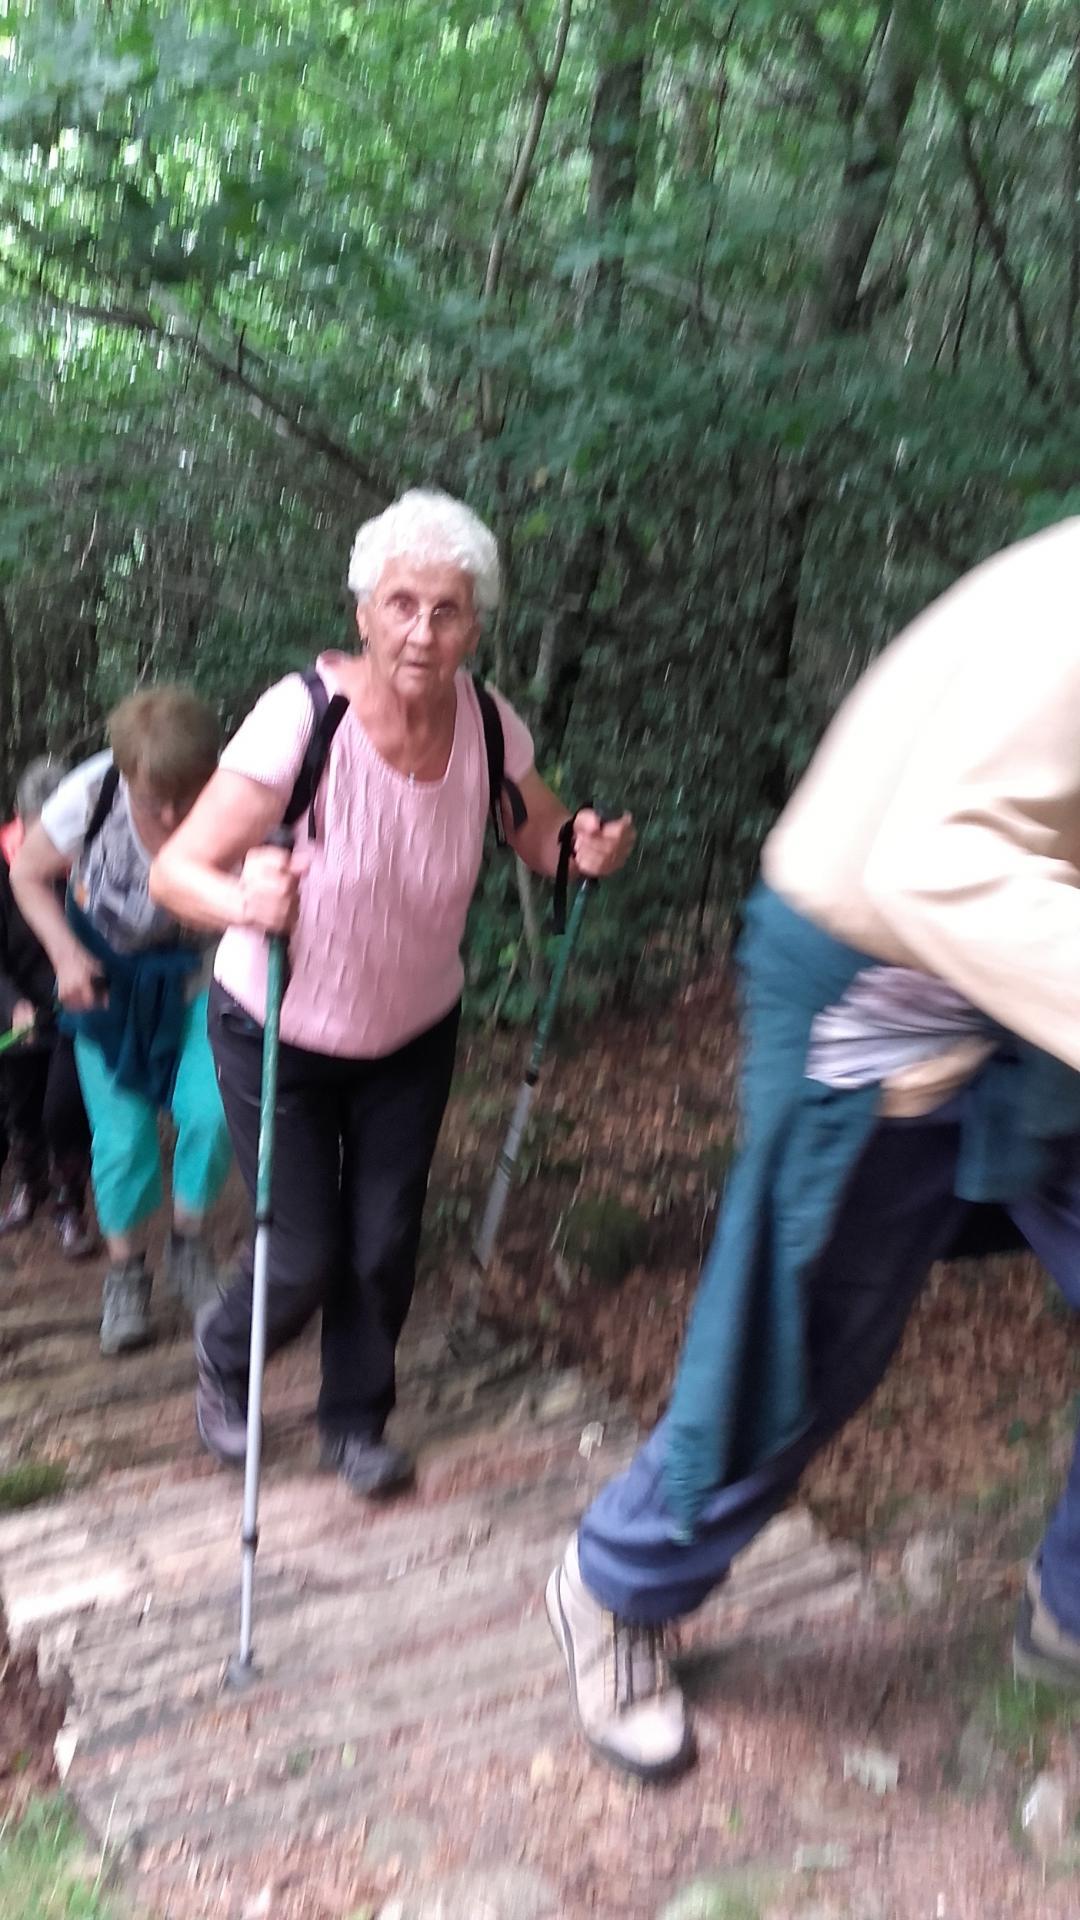 Plateau marmagne le 18 juin 2018 n 3